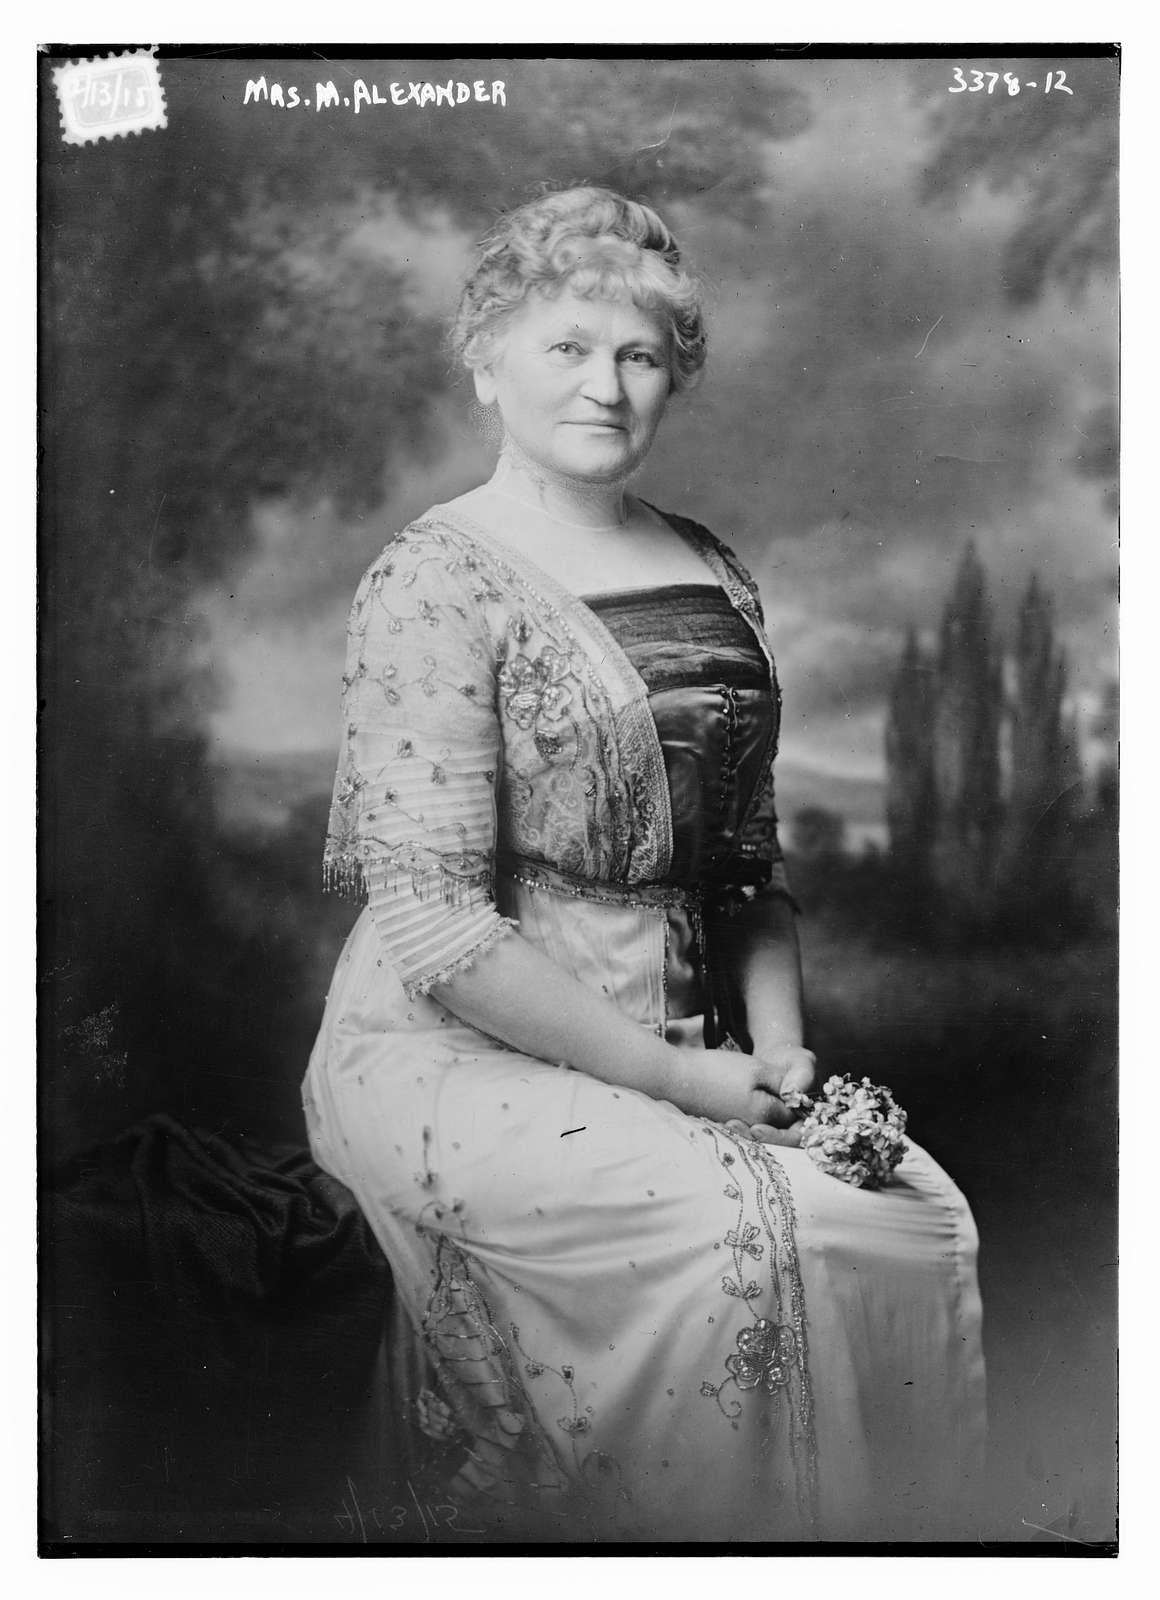 Mrs. M. Alexander